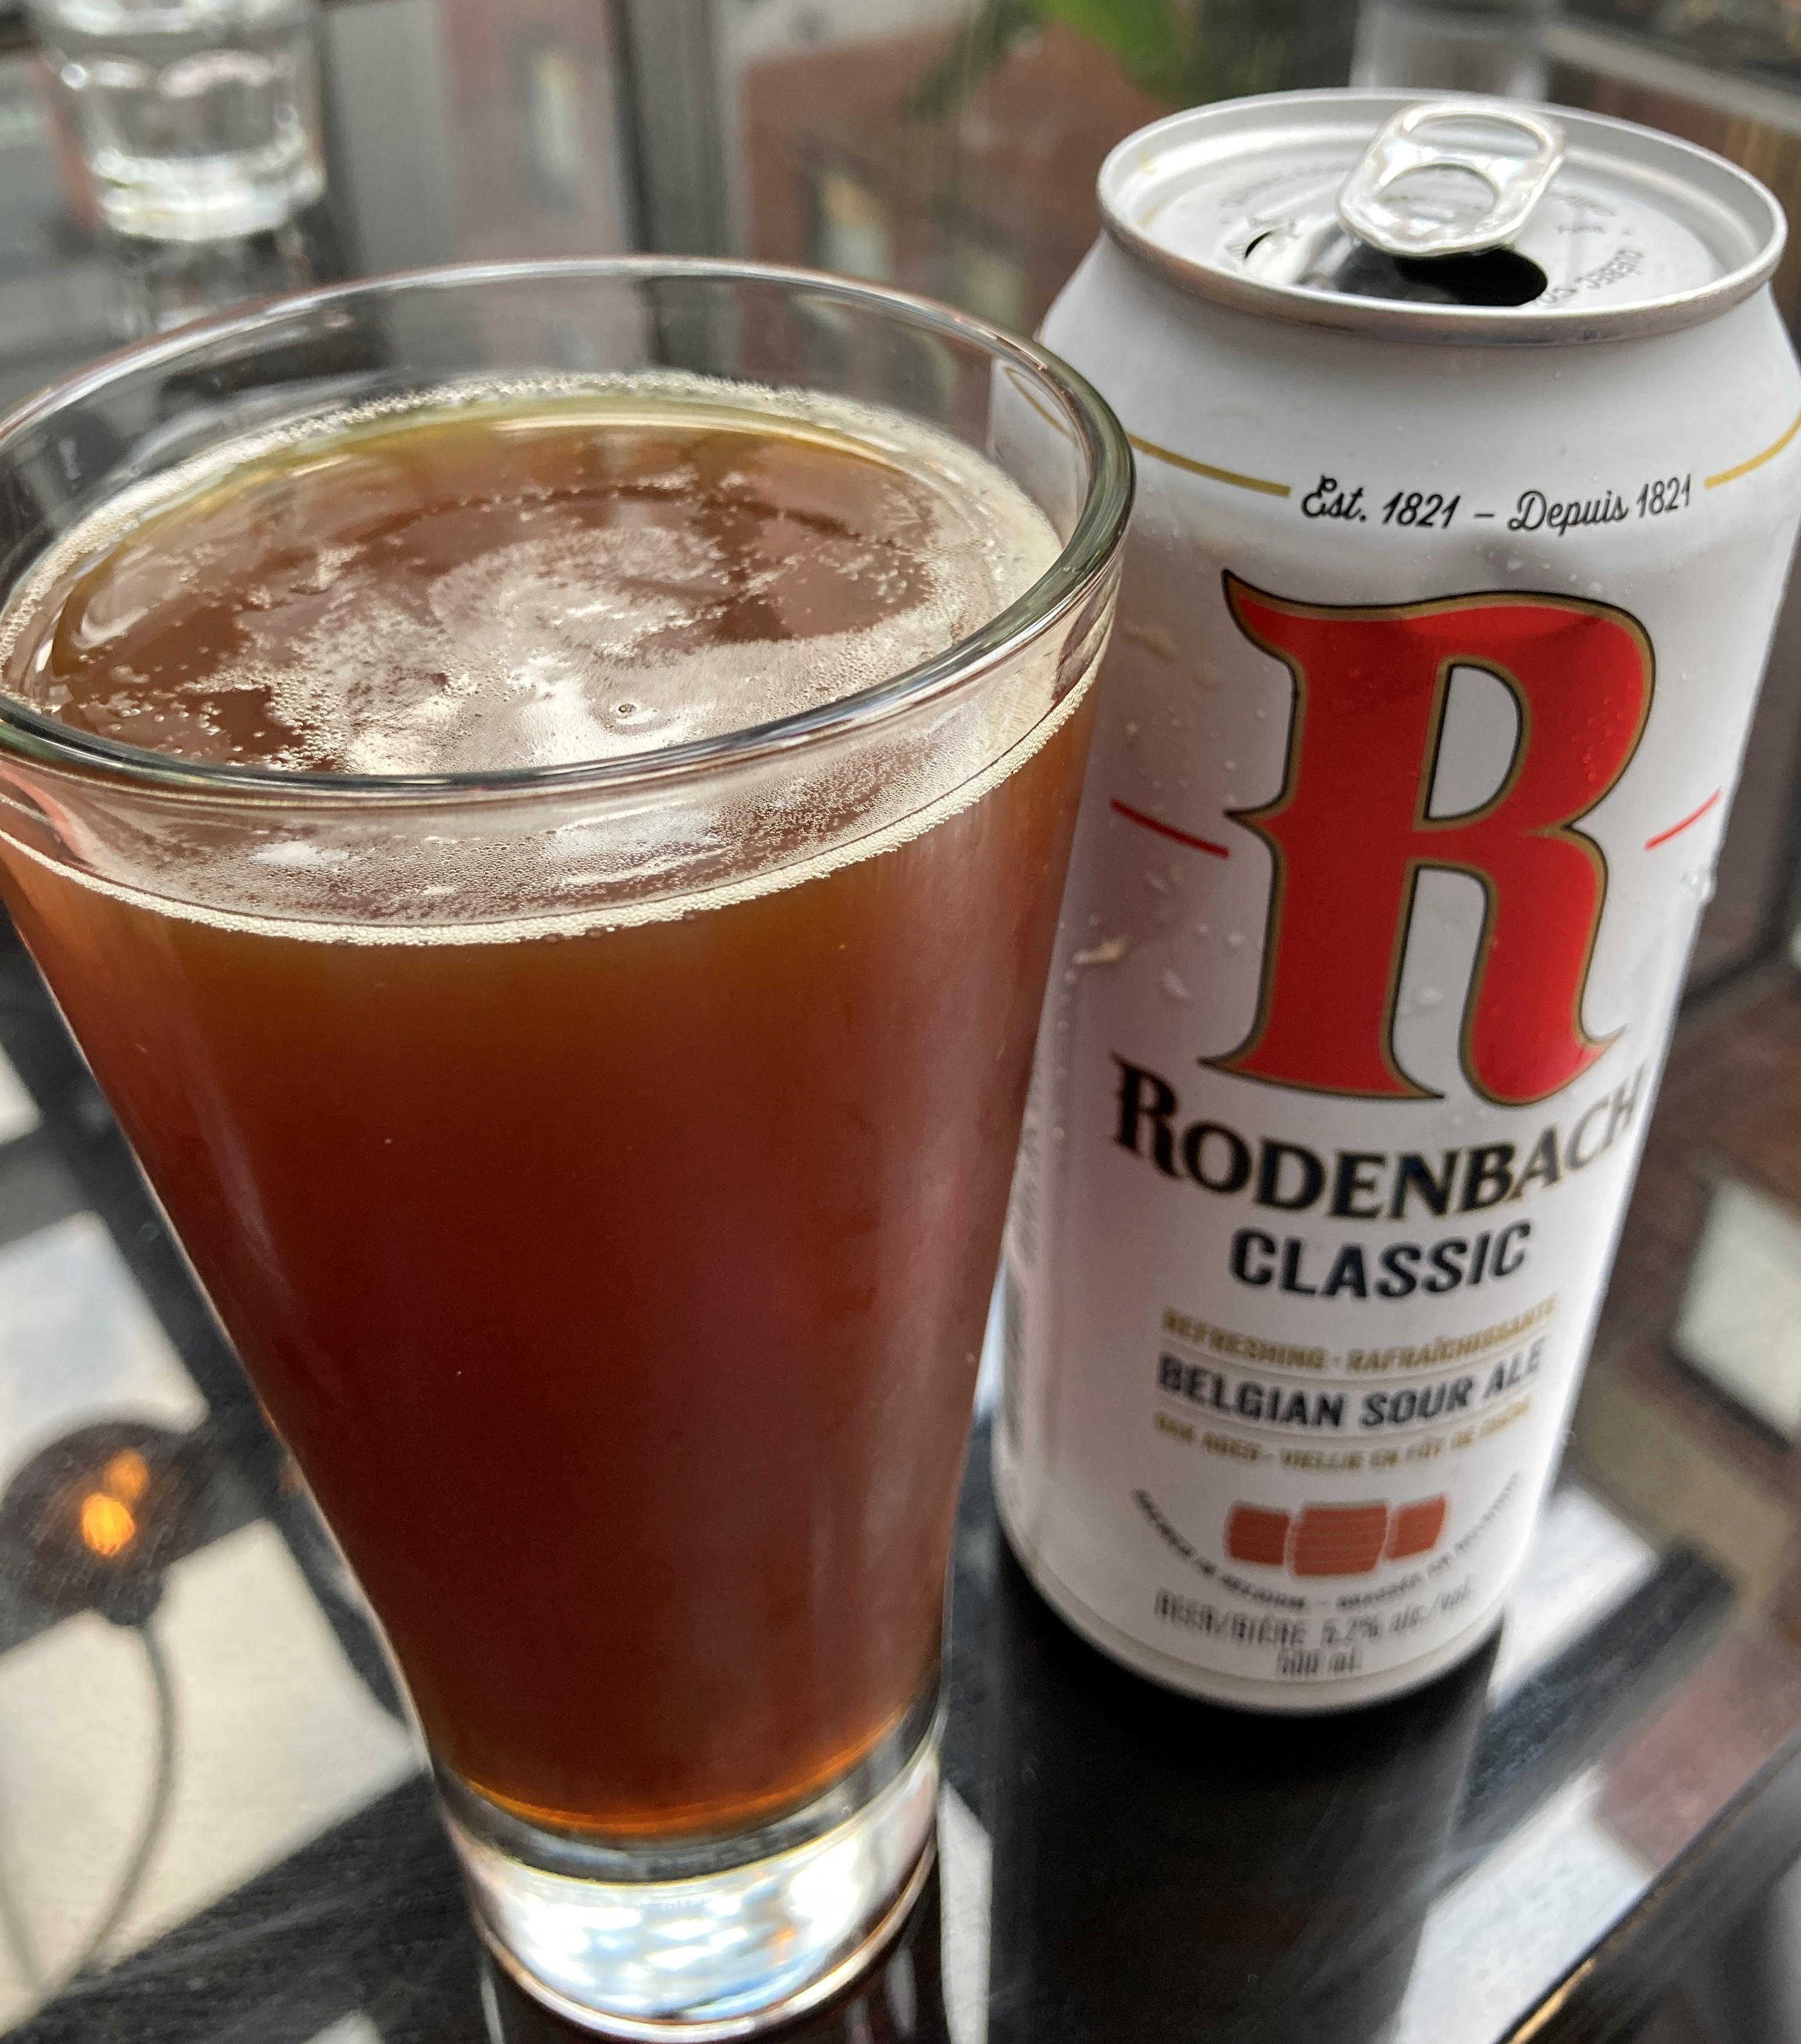 rodenbach_classic_belgian_sour (8)